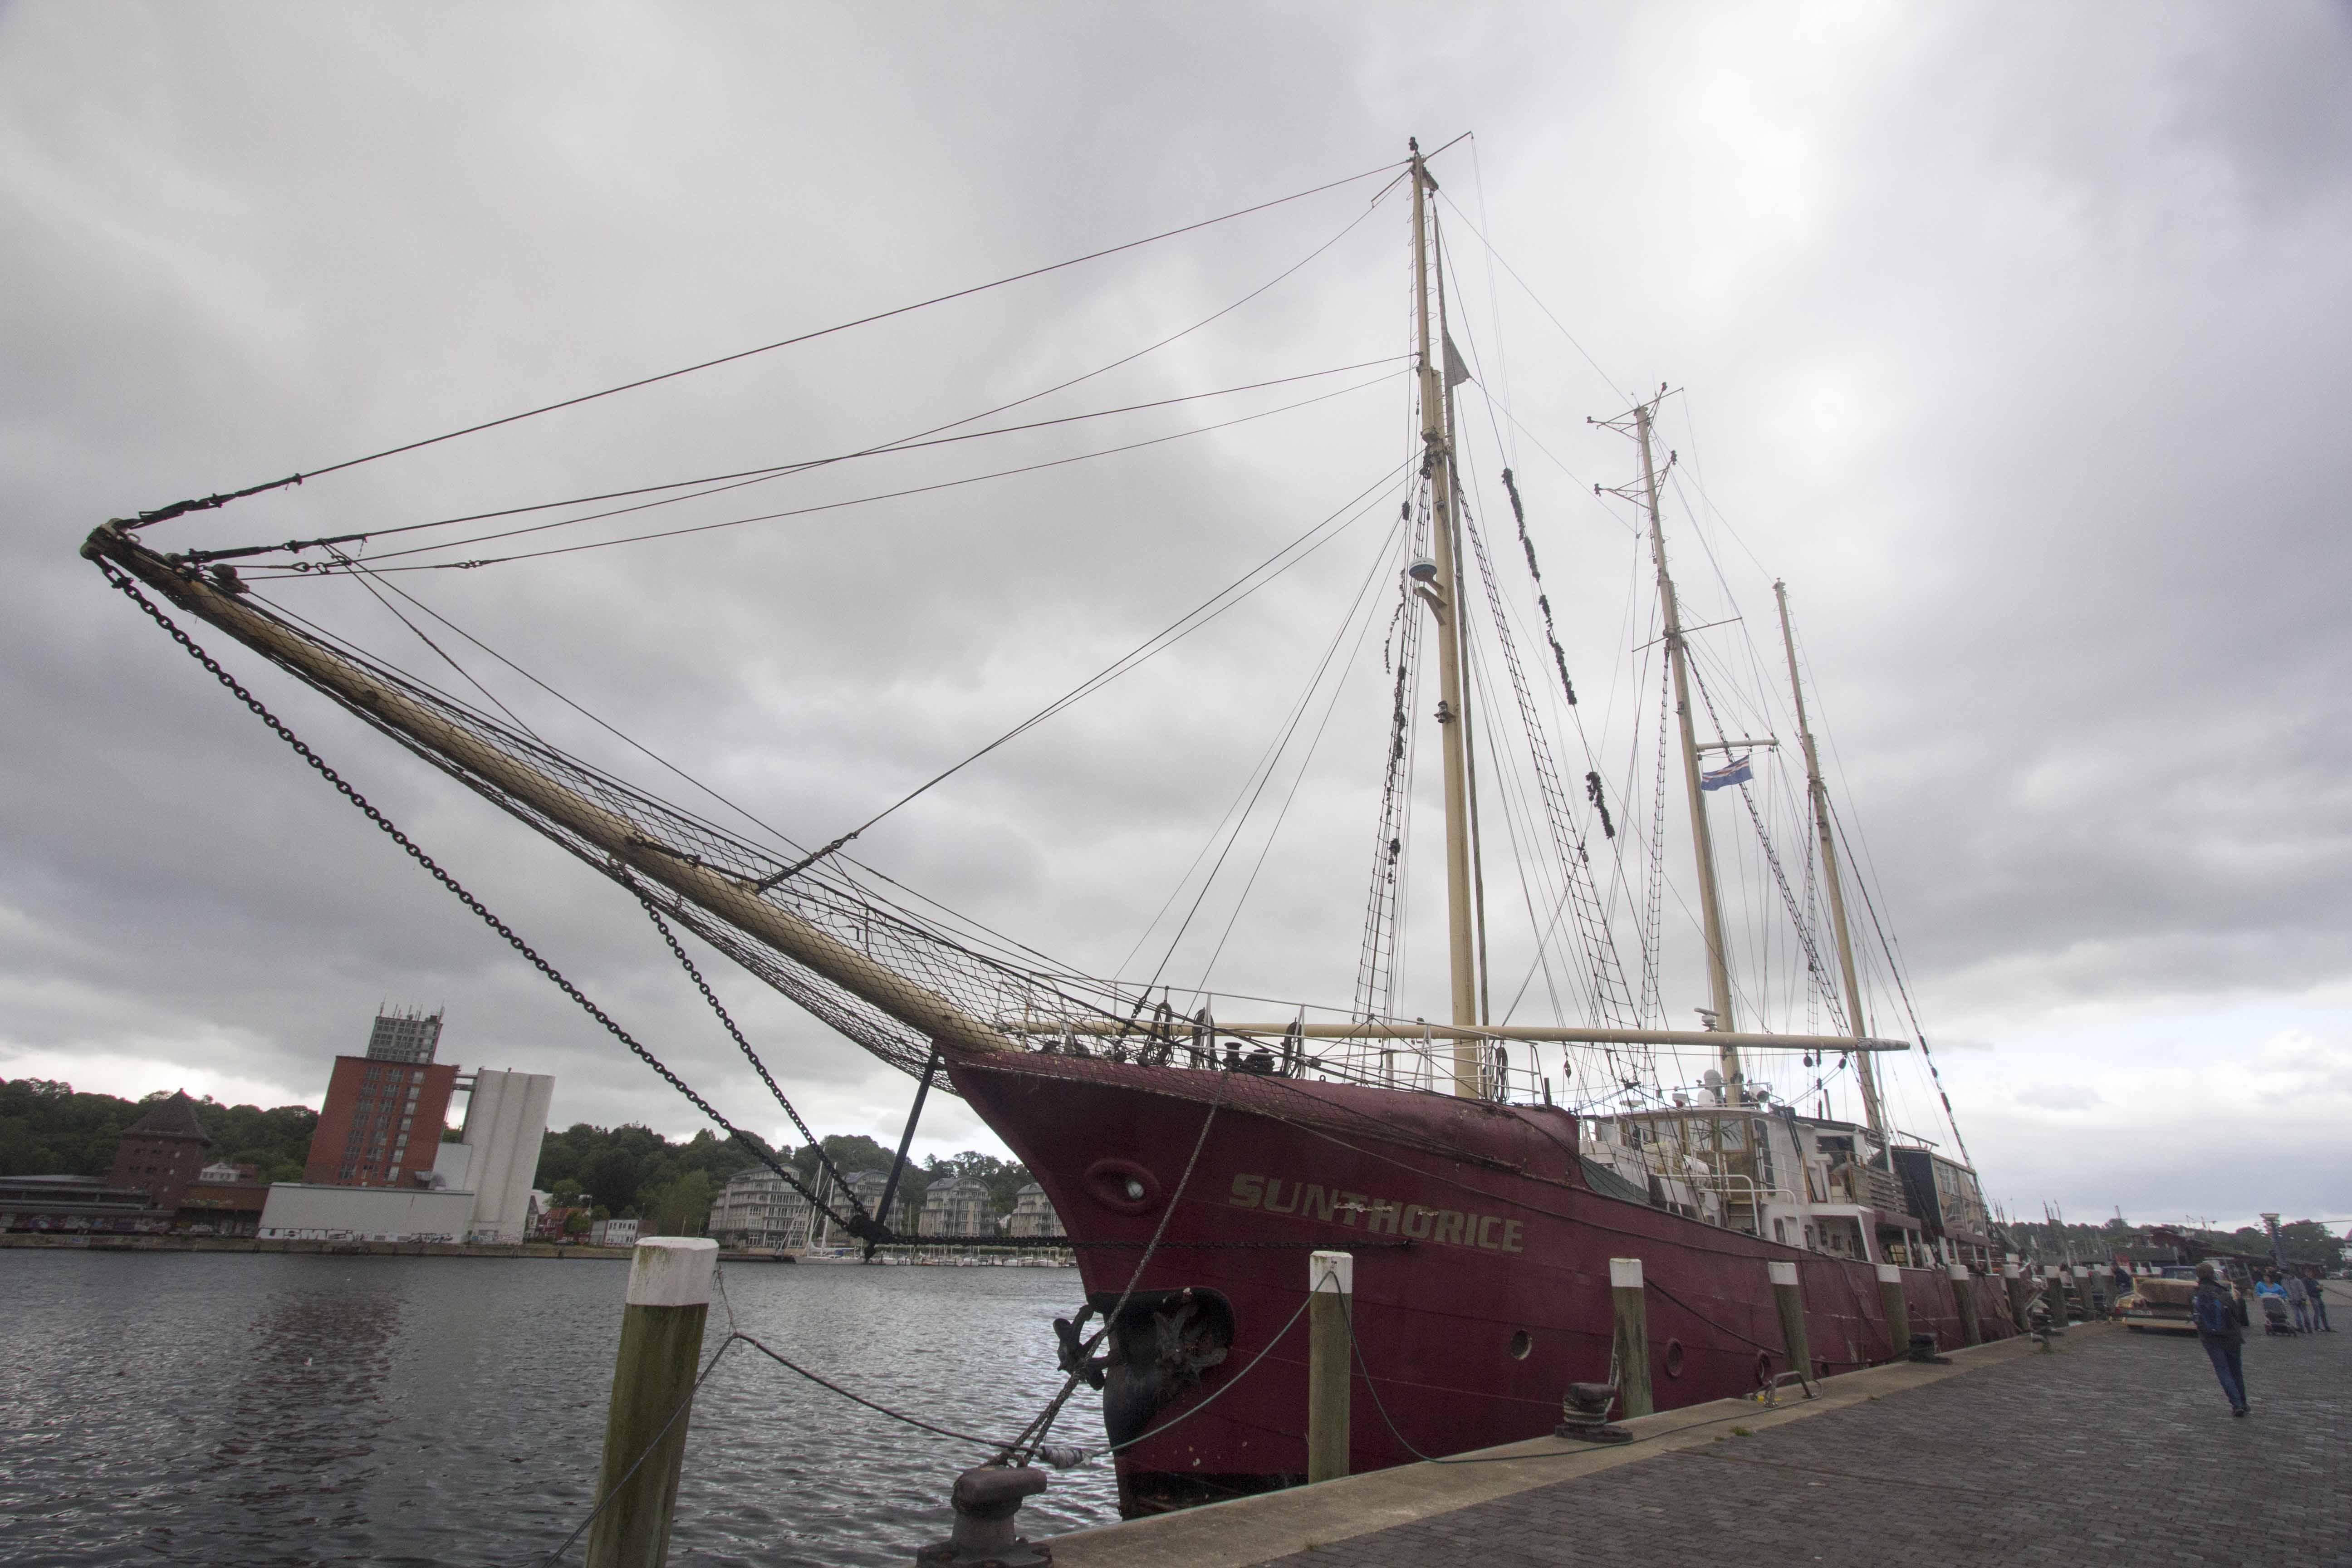 Museumshafen Sunthorice_2